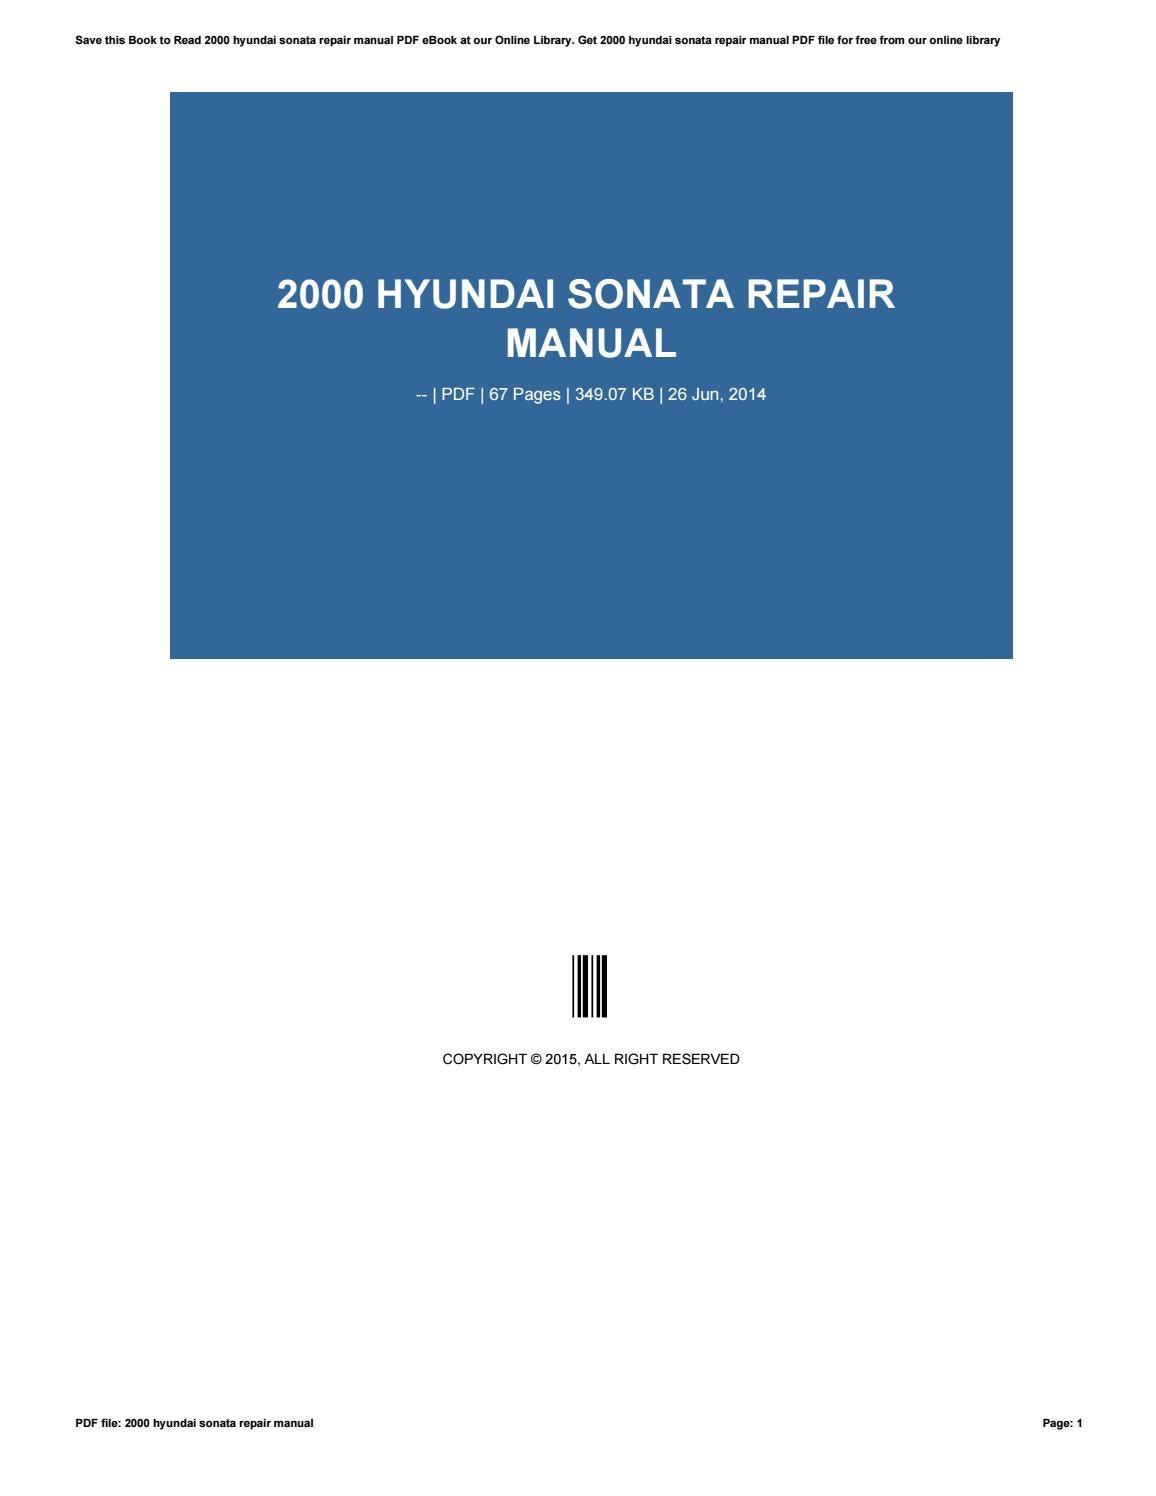 2007 hyundai sonata repair manual free